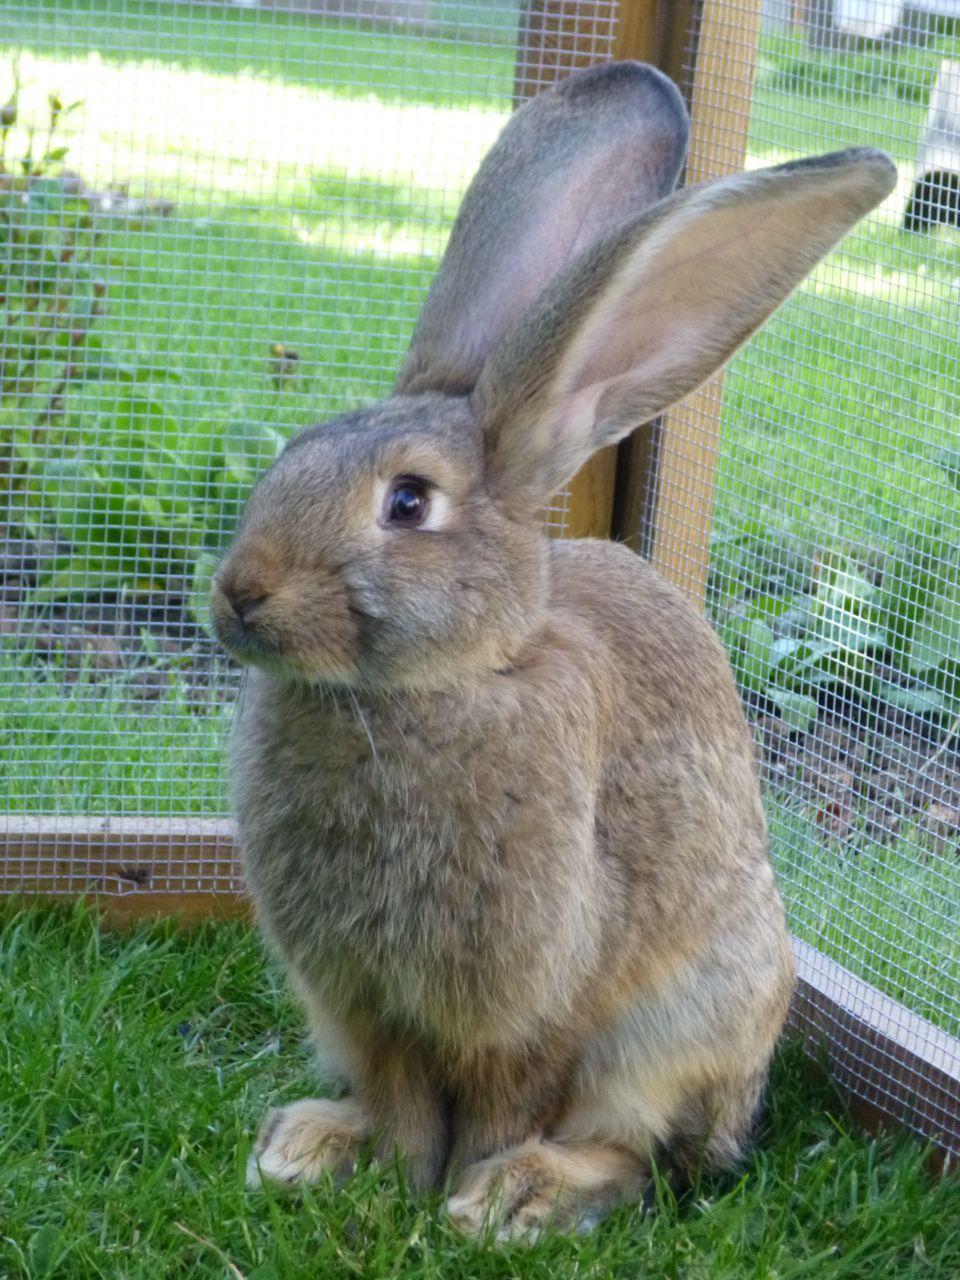 continental giant rabbit - Google Search | Giant rabbit ...